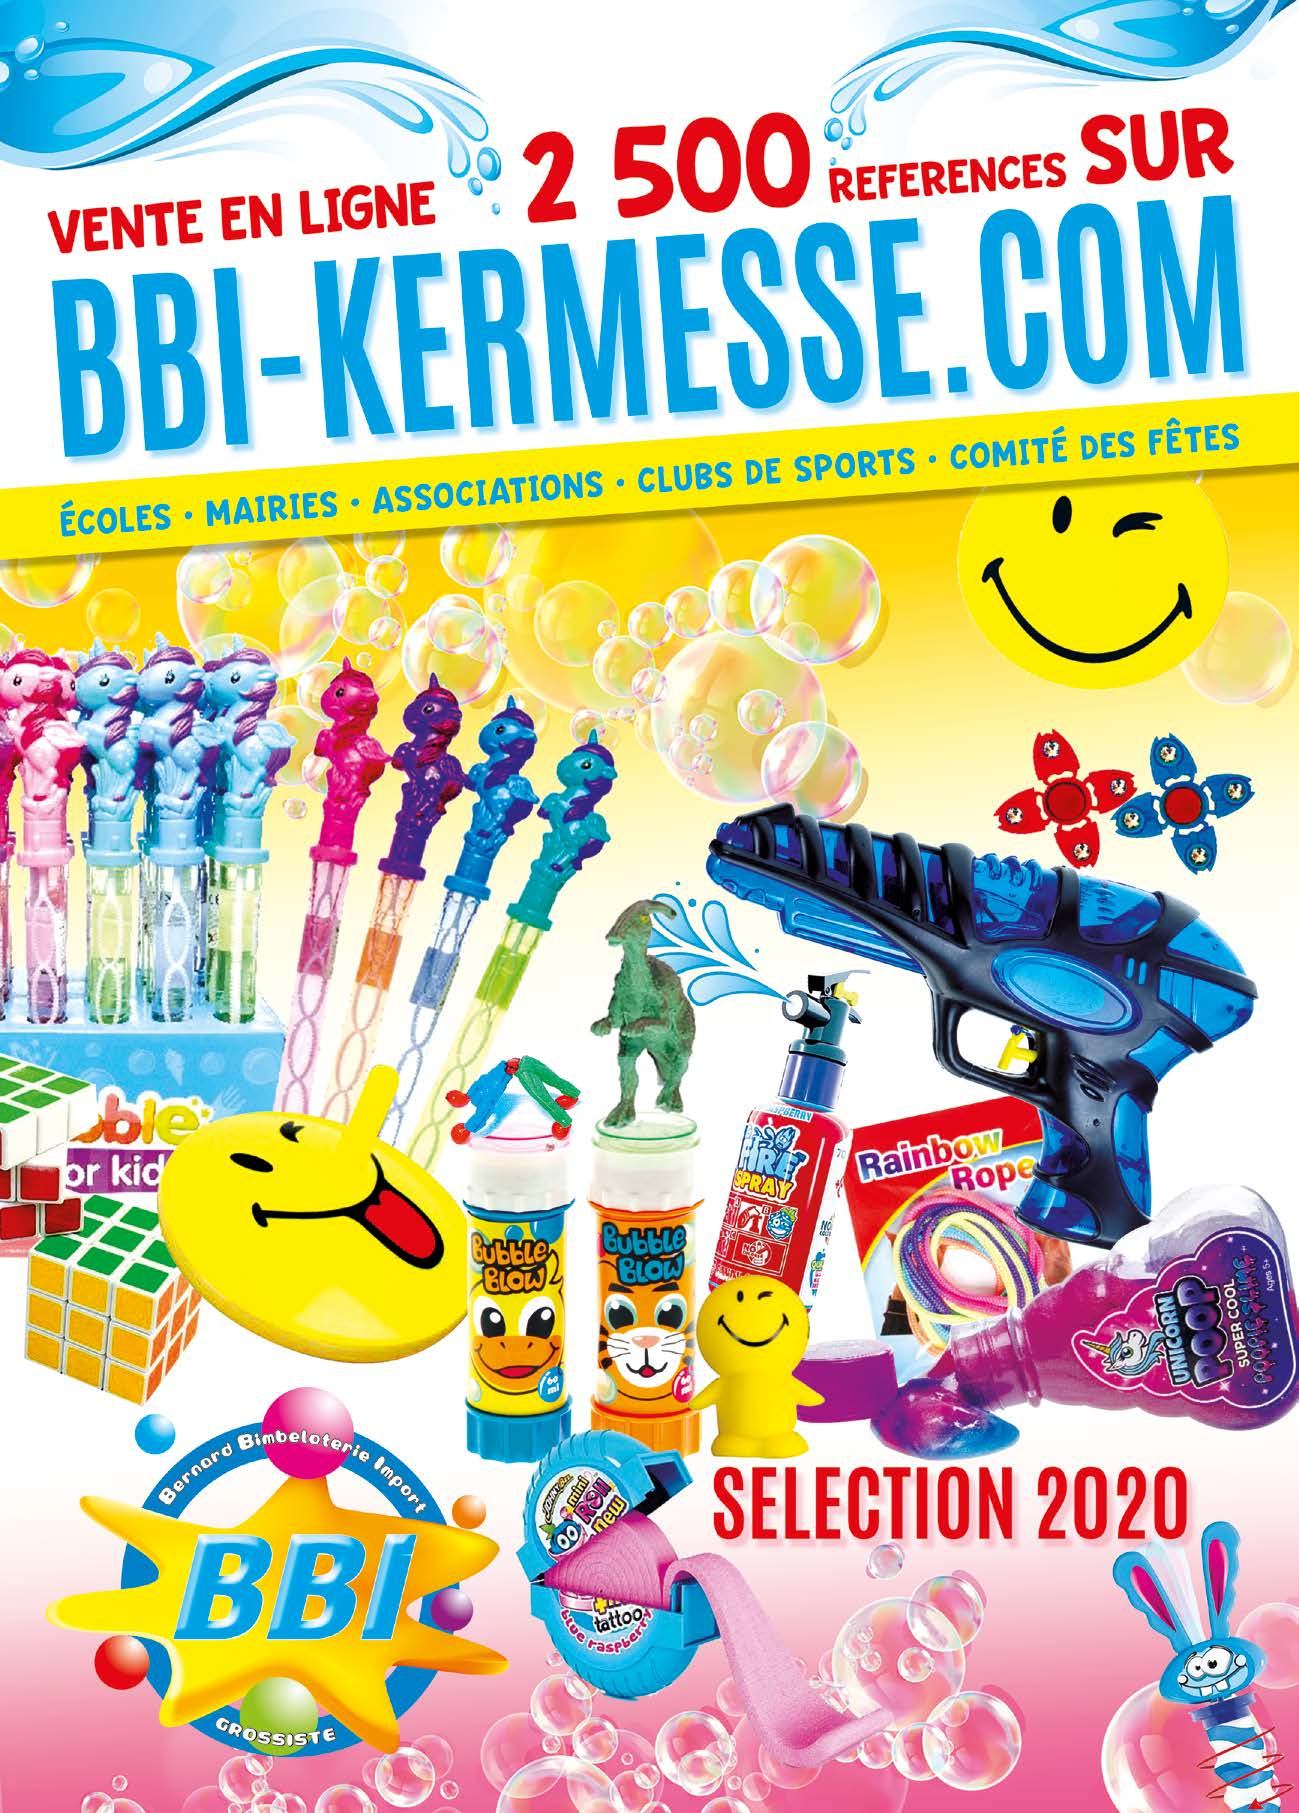 BBI - Jouets pour kermesse